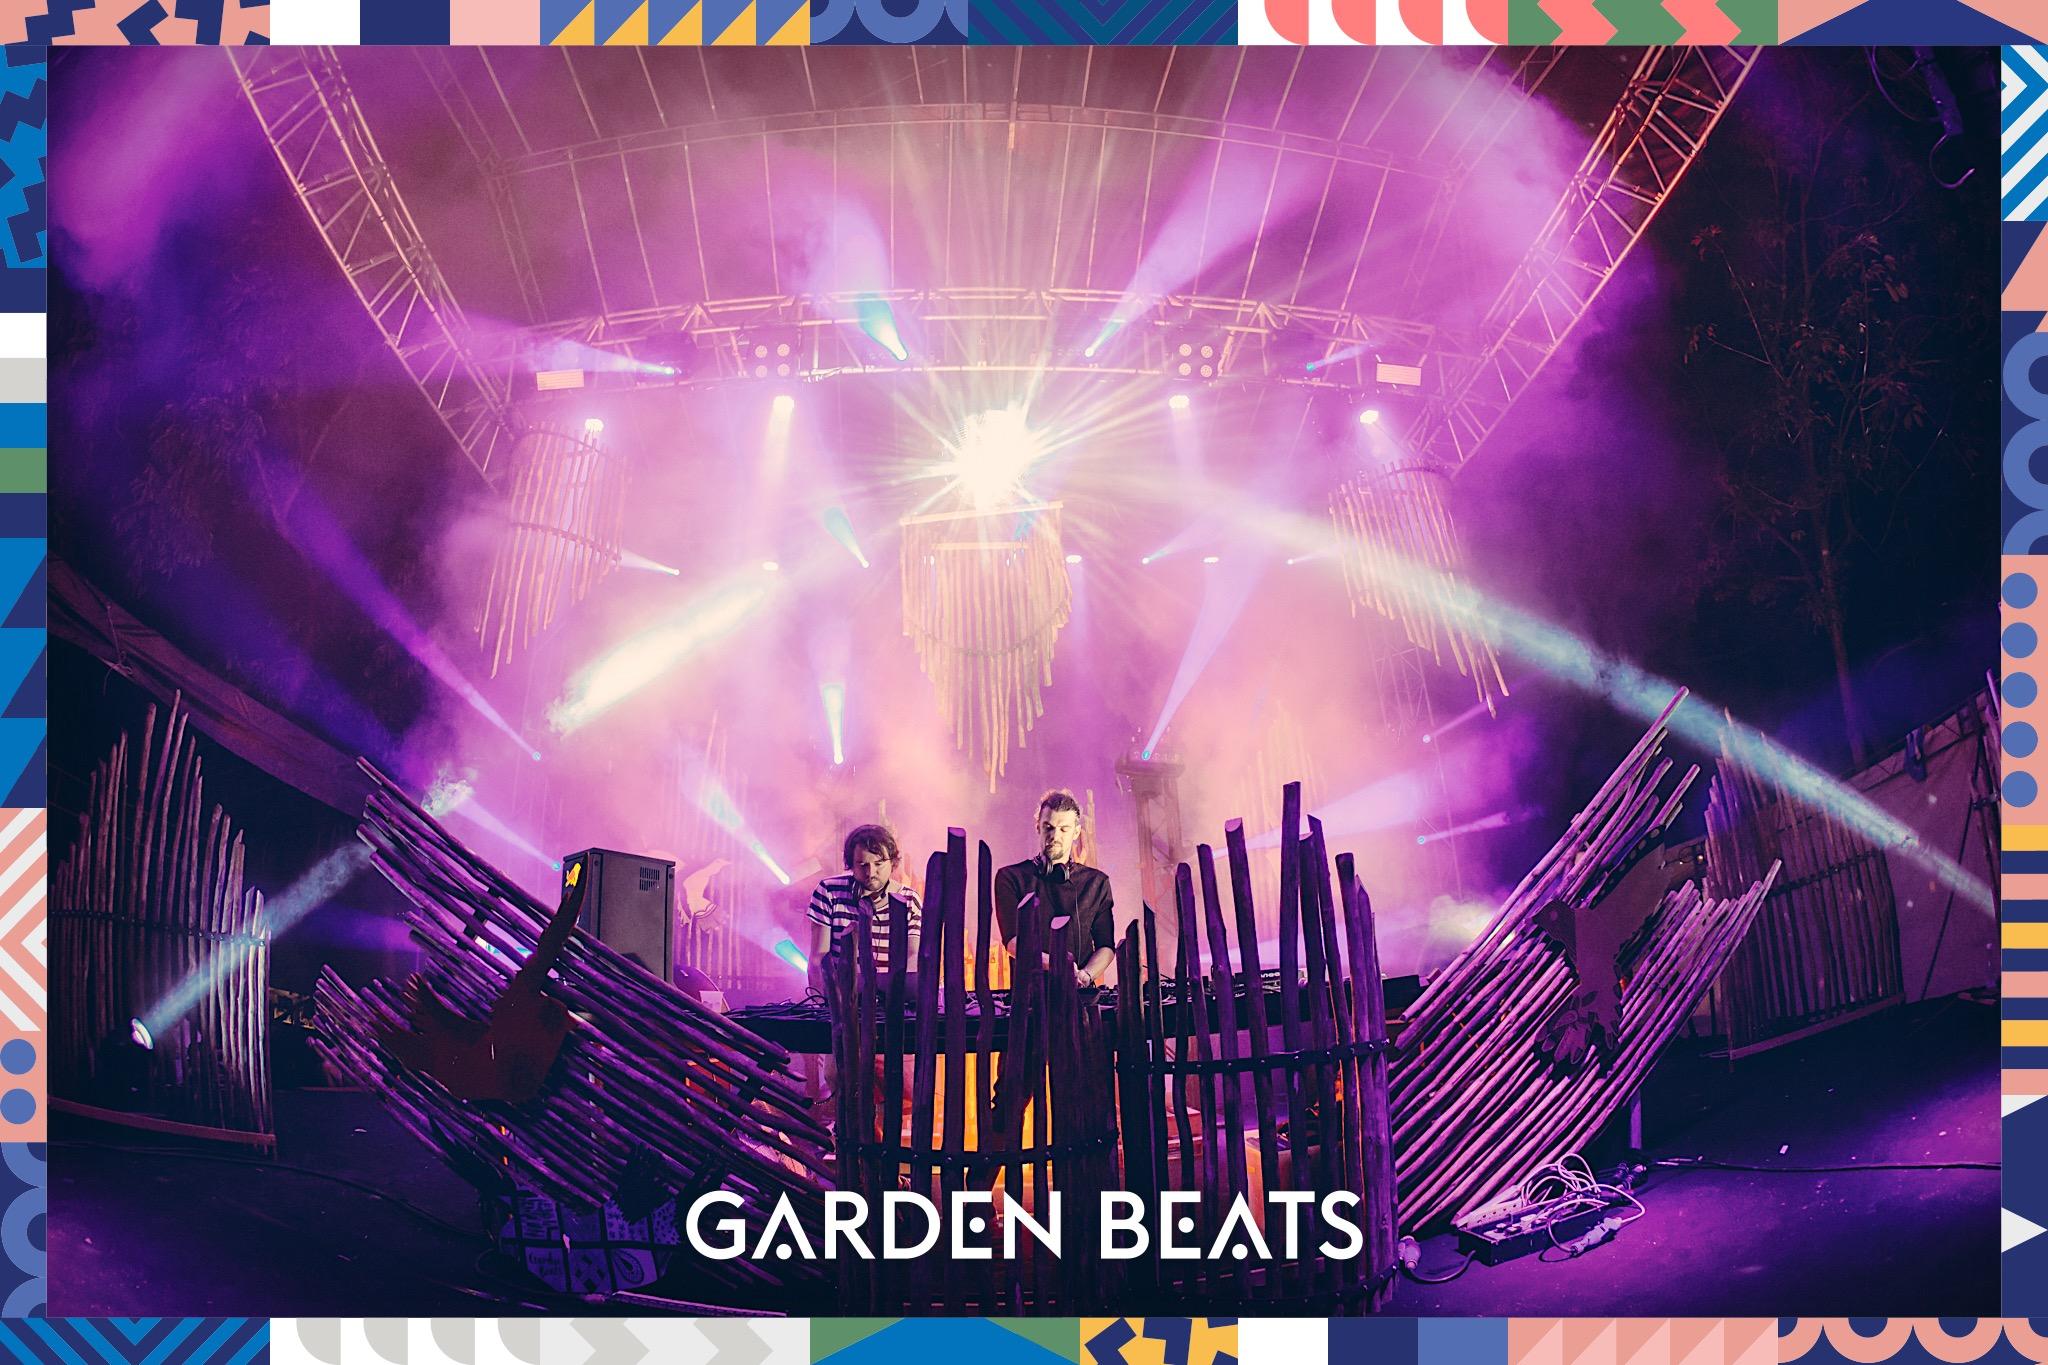 18032017_GardenBeats_Colossal892_WatermarkedGB.jpg